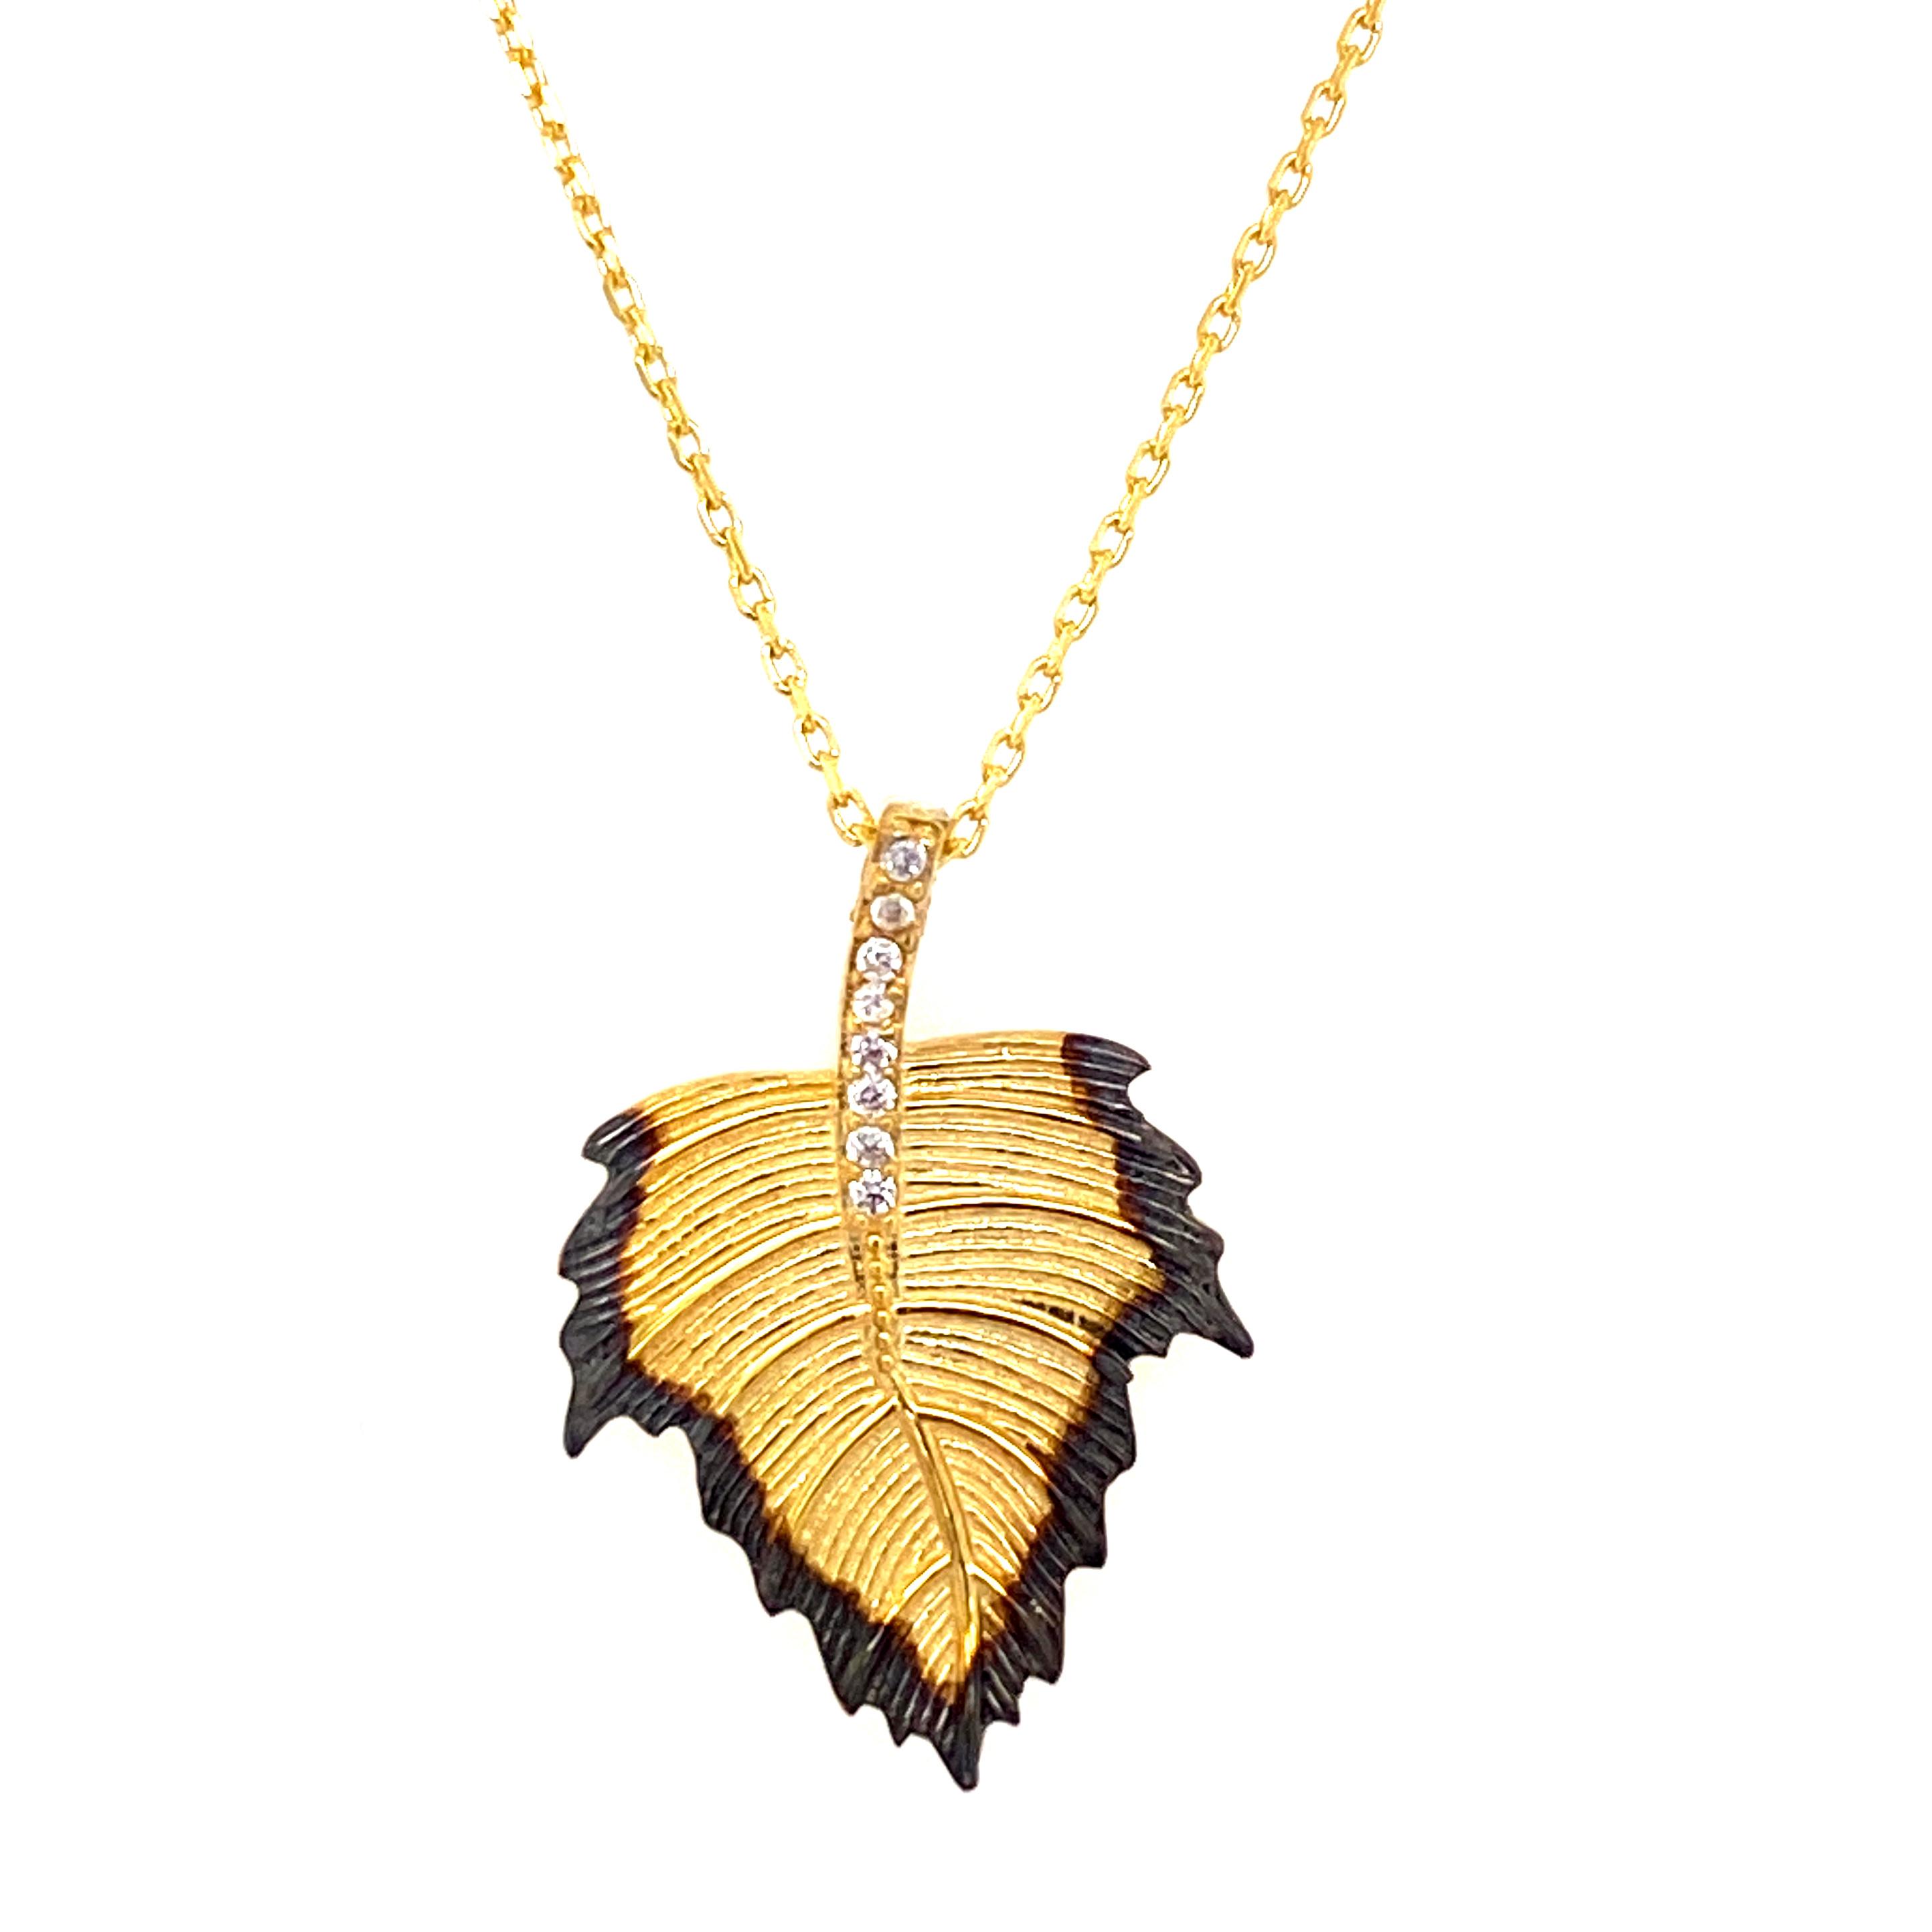 925 Silber Halskette | Blatt Zirkonia 2.2